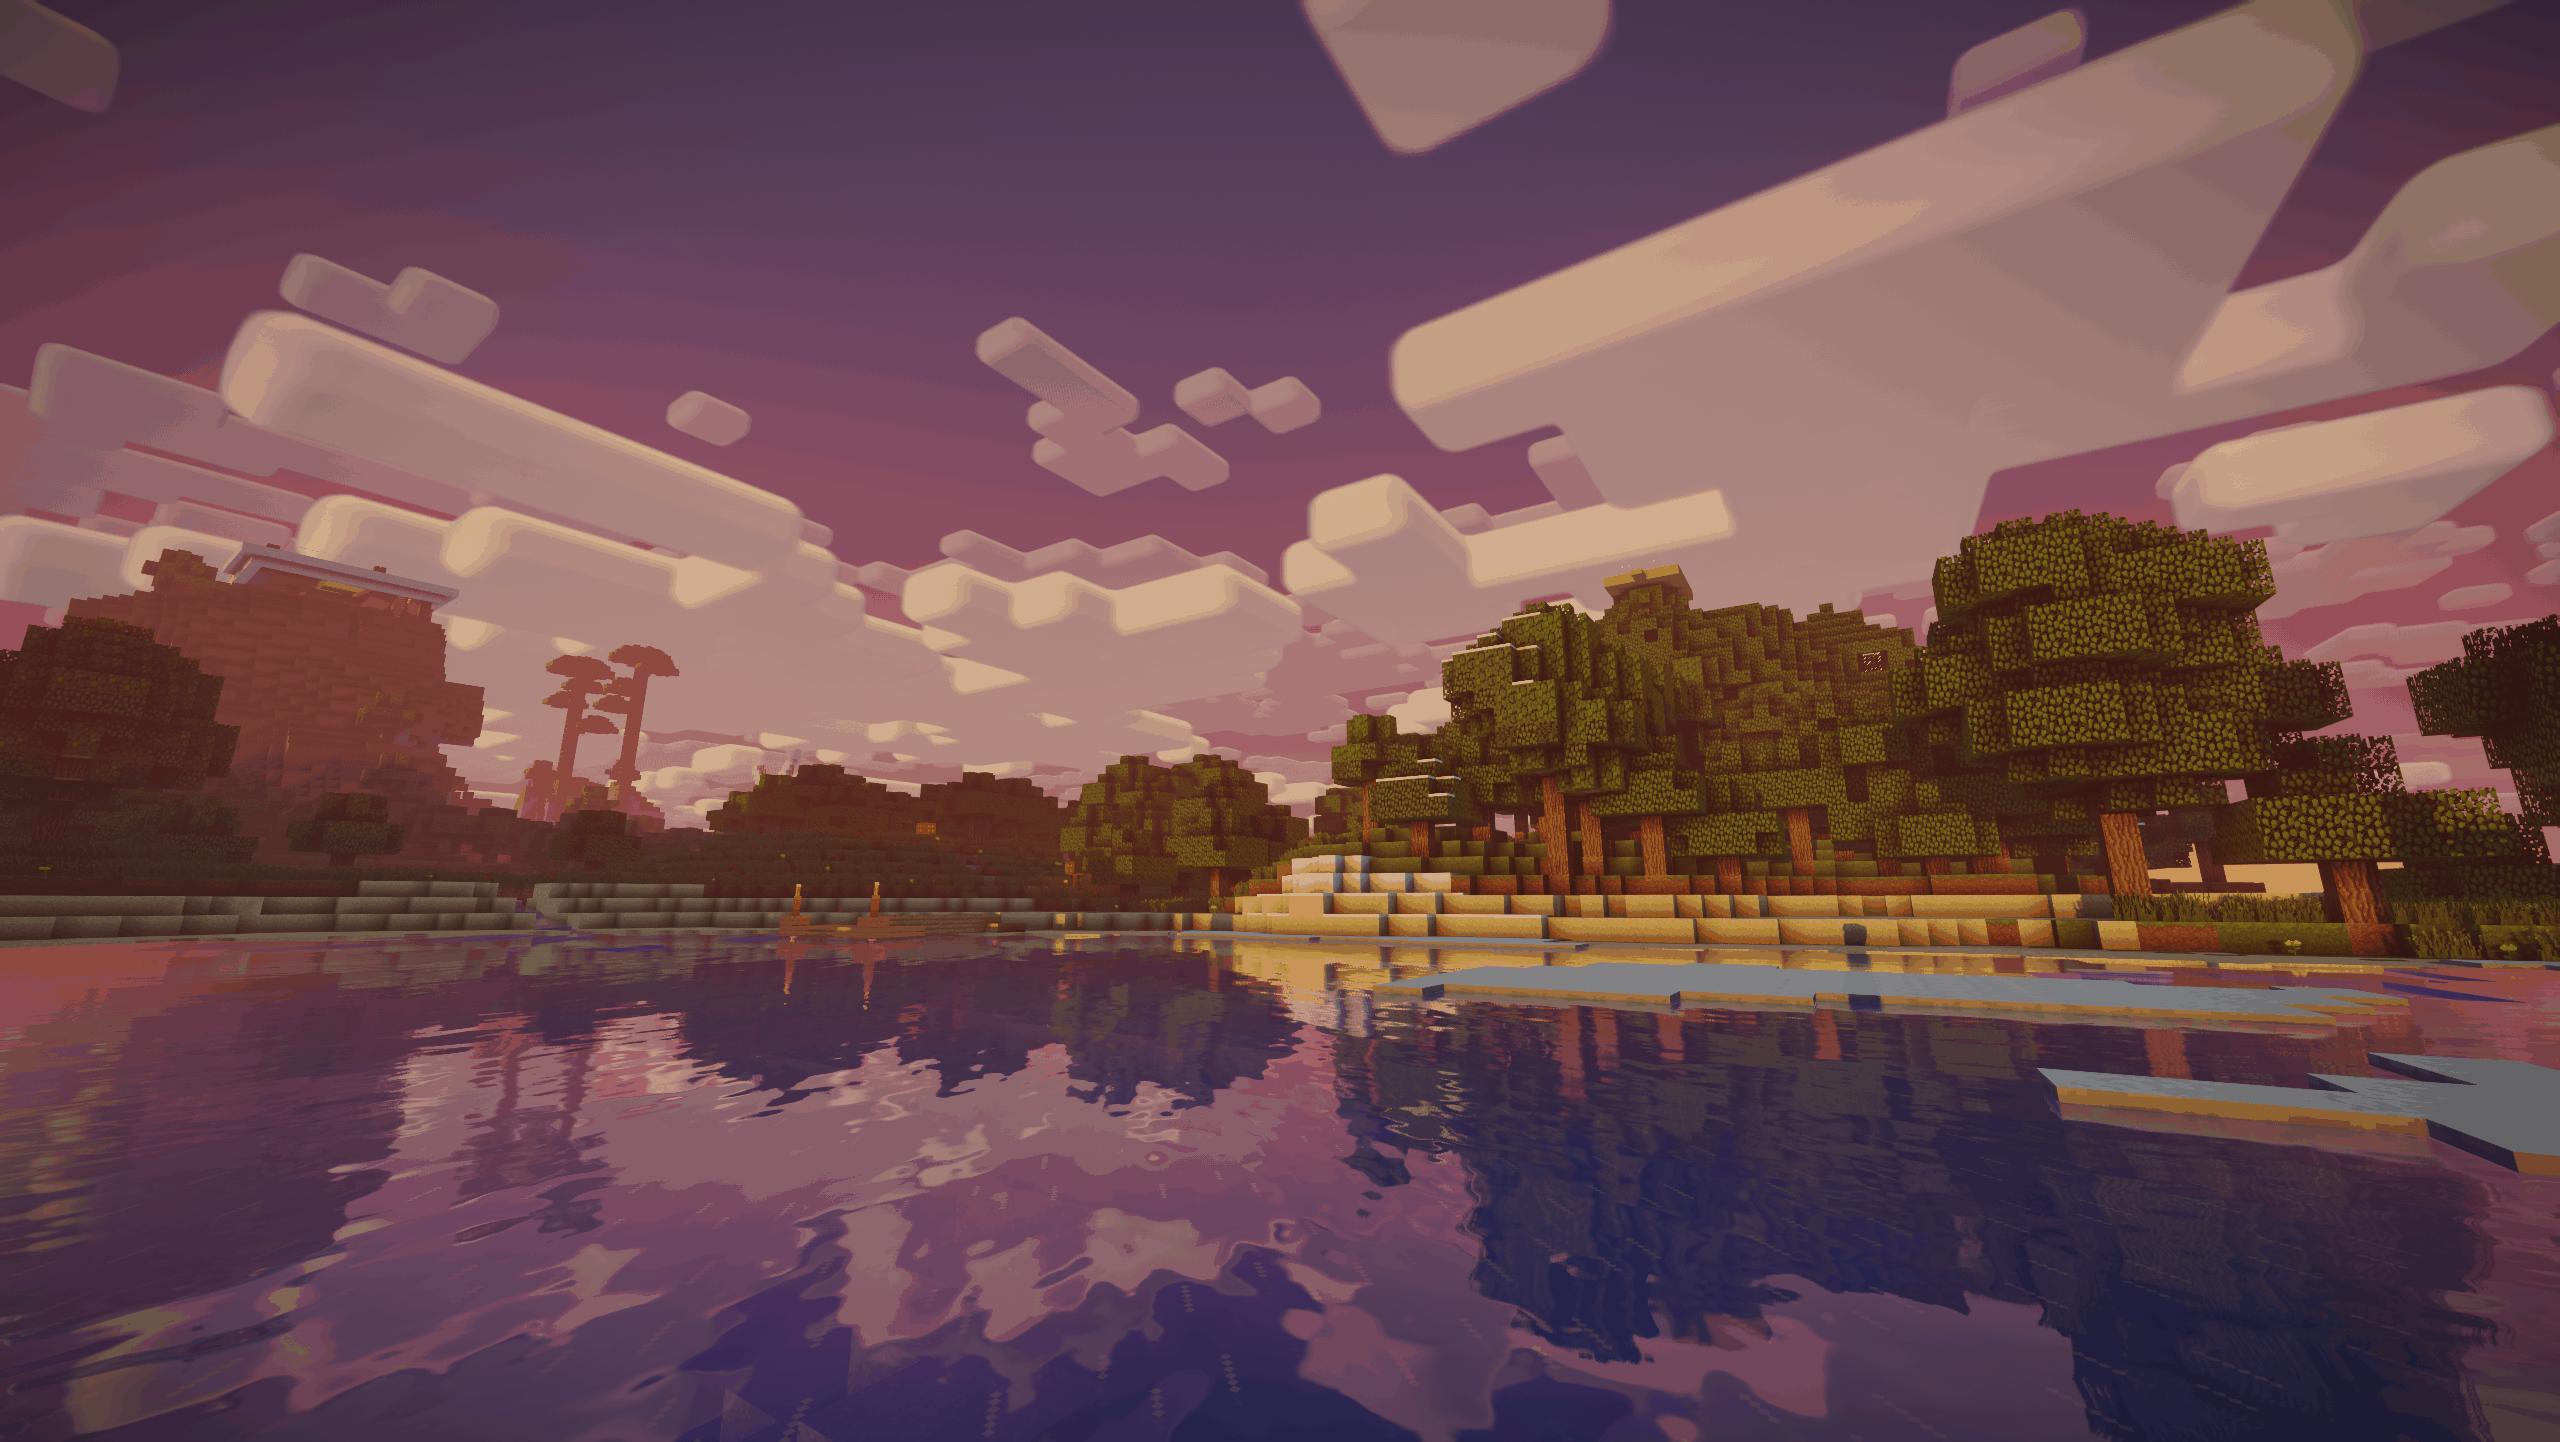 Nostlagia Shader : Une fin d'après midi dans Minecraft